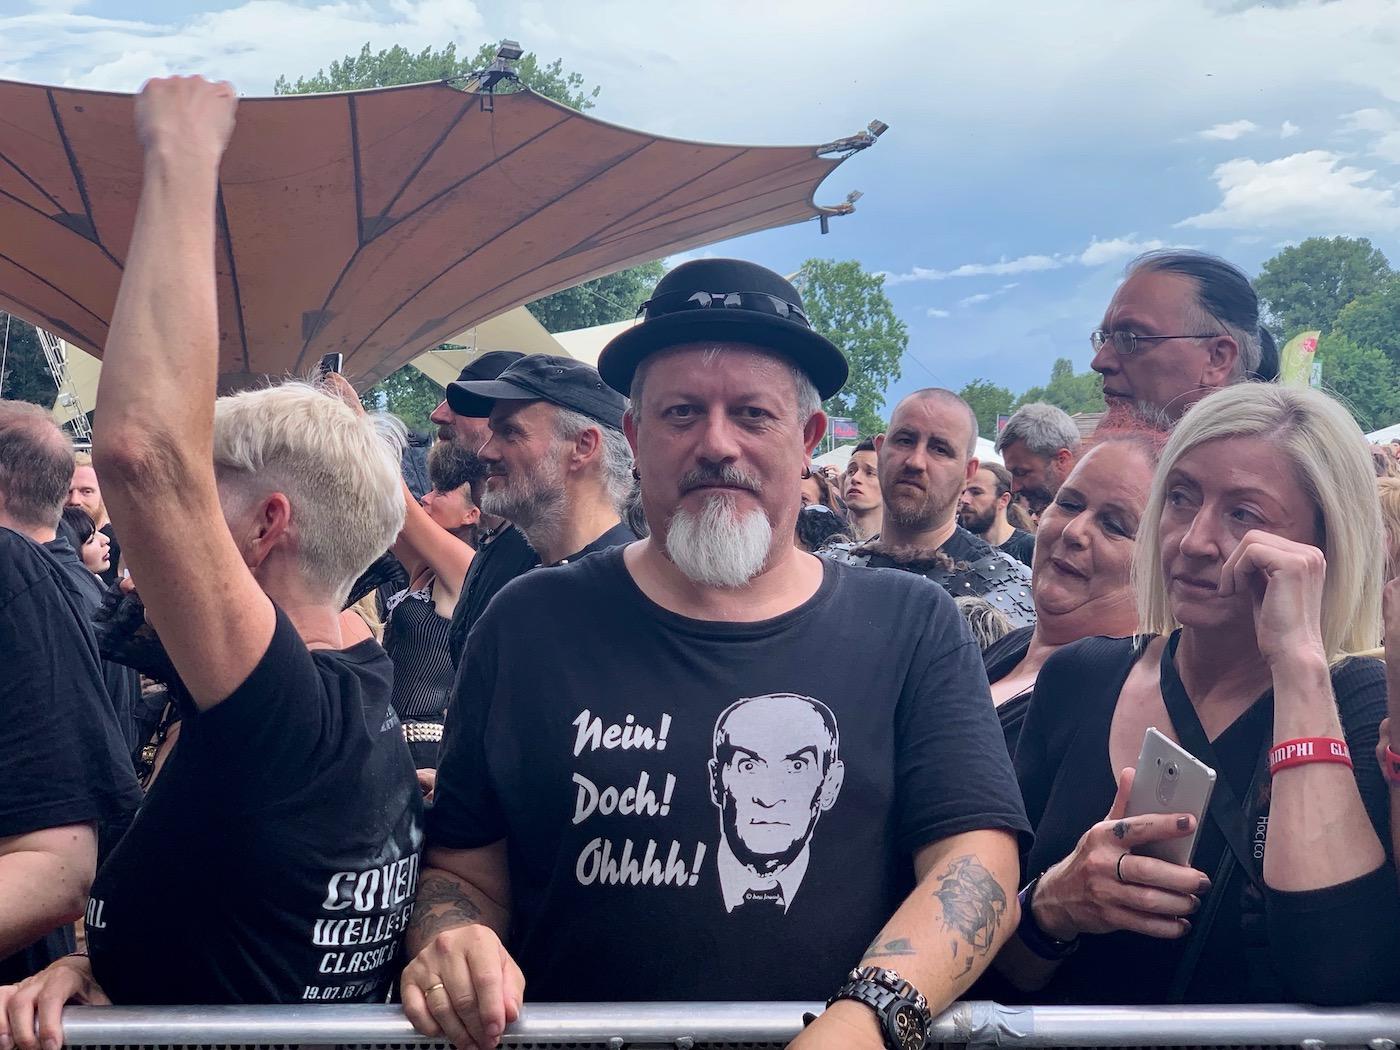 mark_benecke_amphi_festival_koeln_2019 - 56.jpg